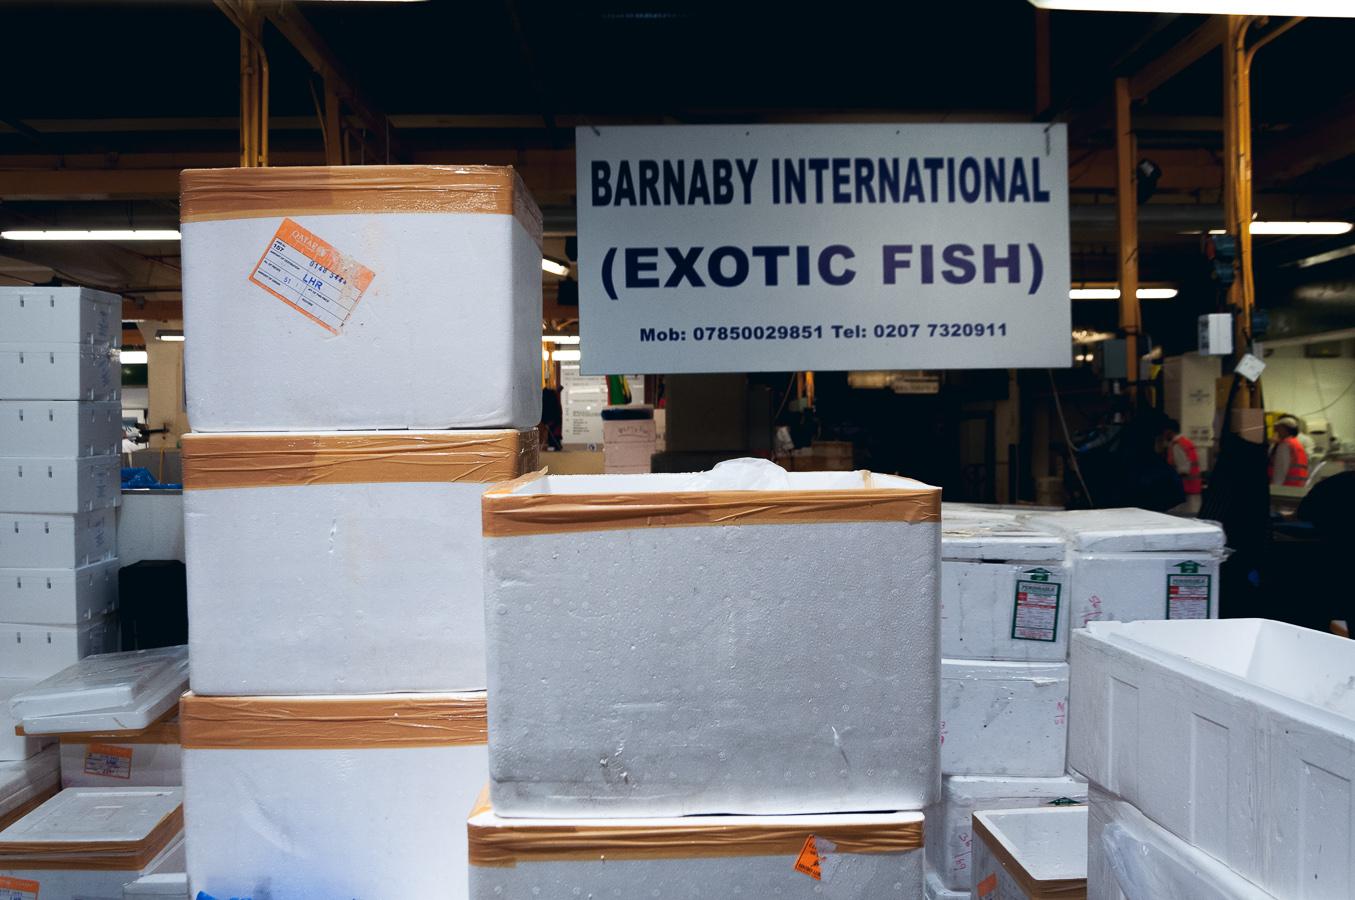 billings-gate-market-exotic-fish-stall.jpg